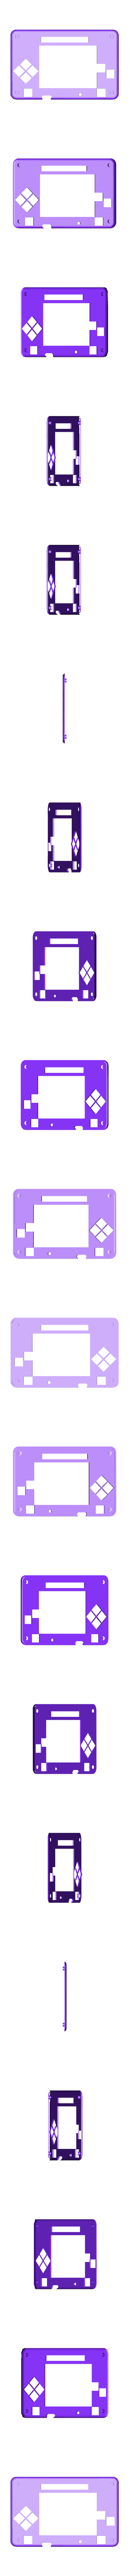 pybadge-front.stl Download free STL file PyBadge Case • 3D print model, Adafruit